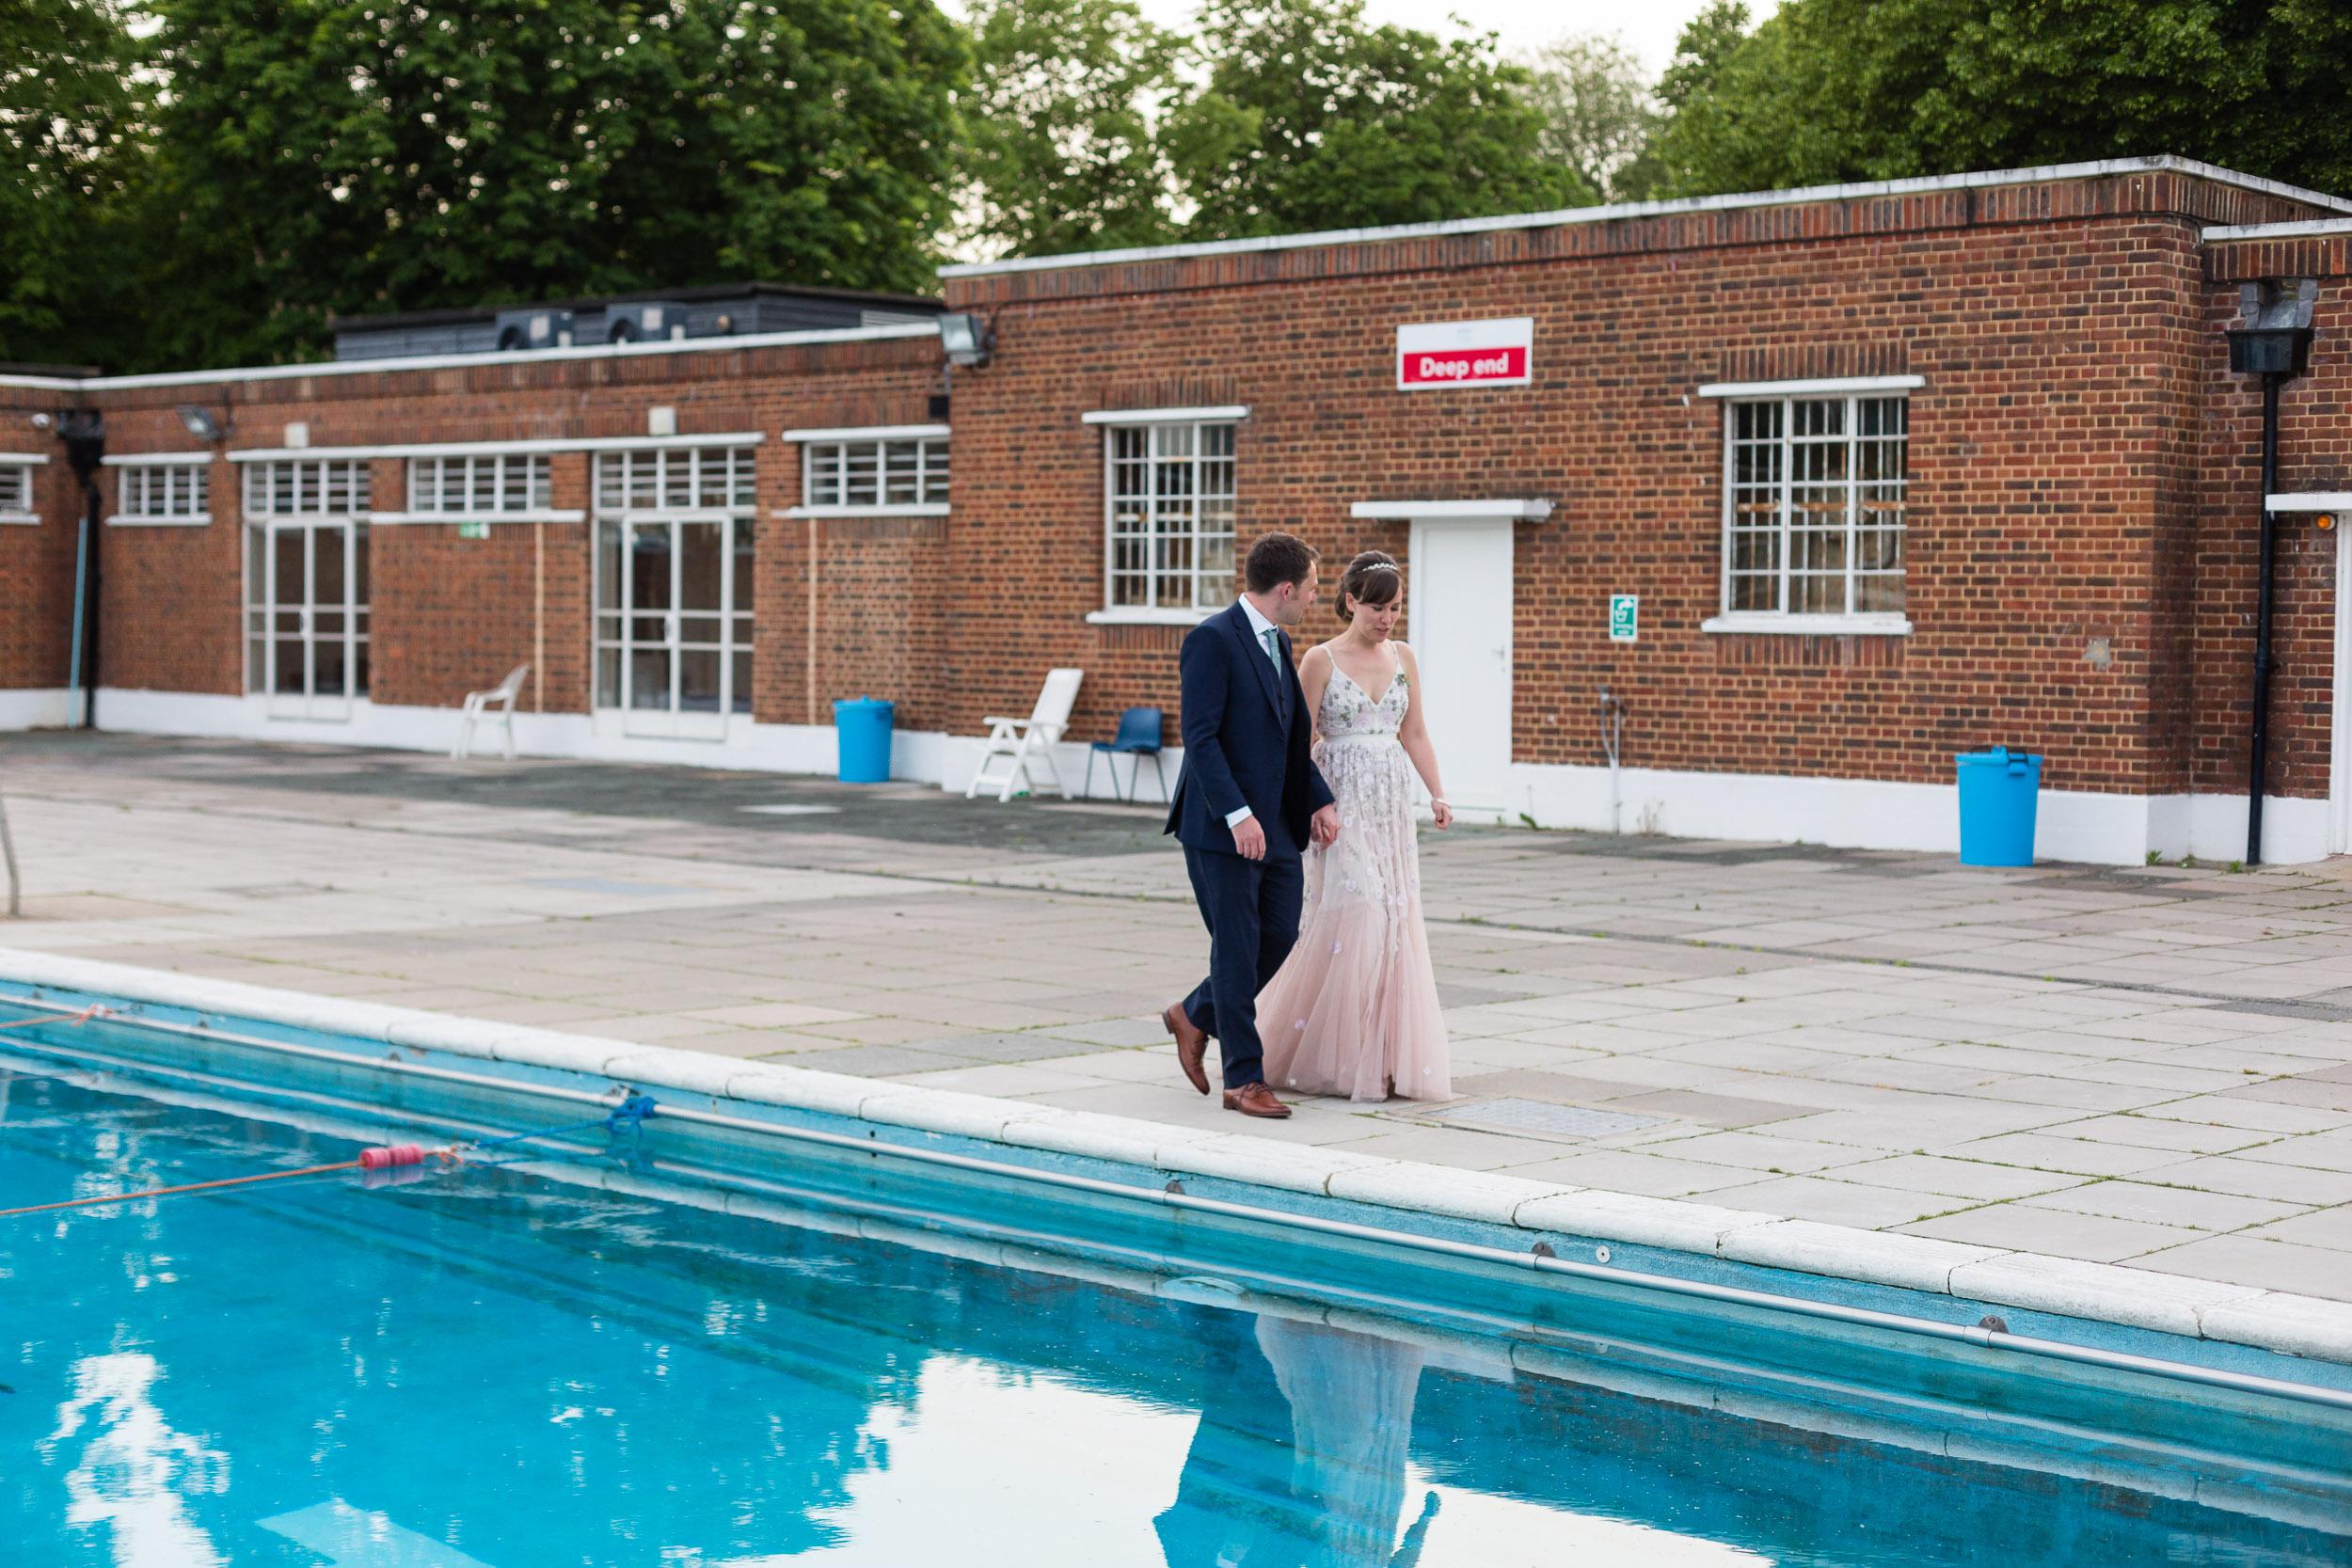 brockwell-lido-brixton-herne-hill-wedding-380.jpg